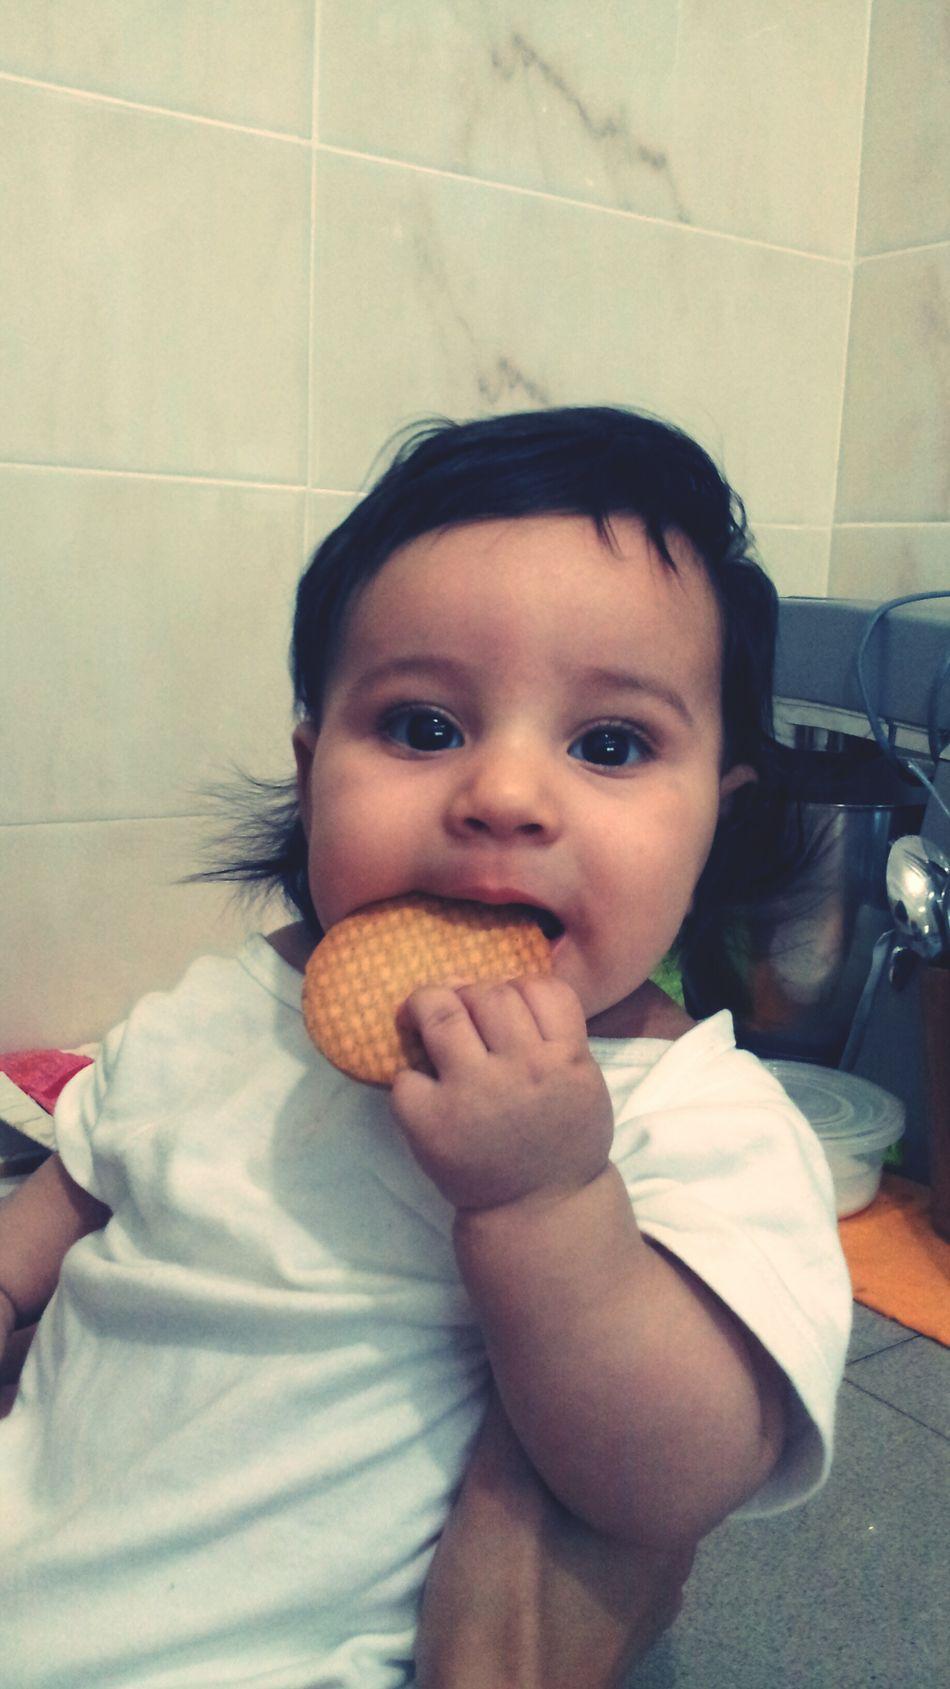 Childhood Innocence Babyboy Enfant Litle Boy Baby ❤ My Son ❤ Bébé ♥ Cute Baby Boy Petit Garcon